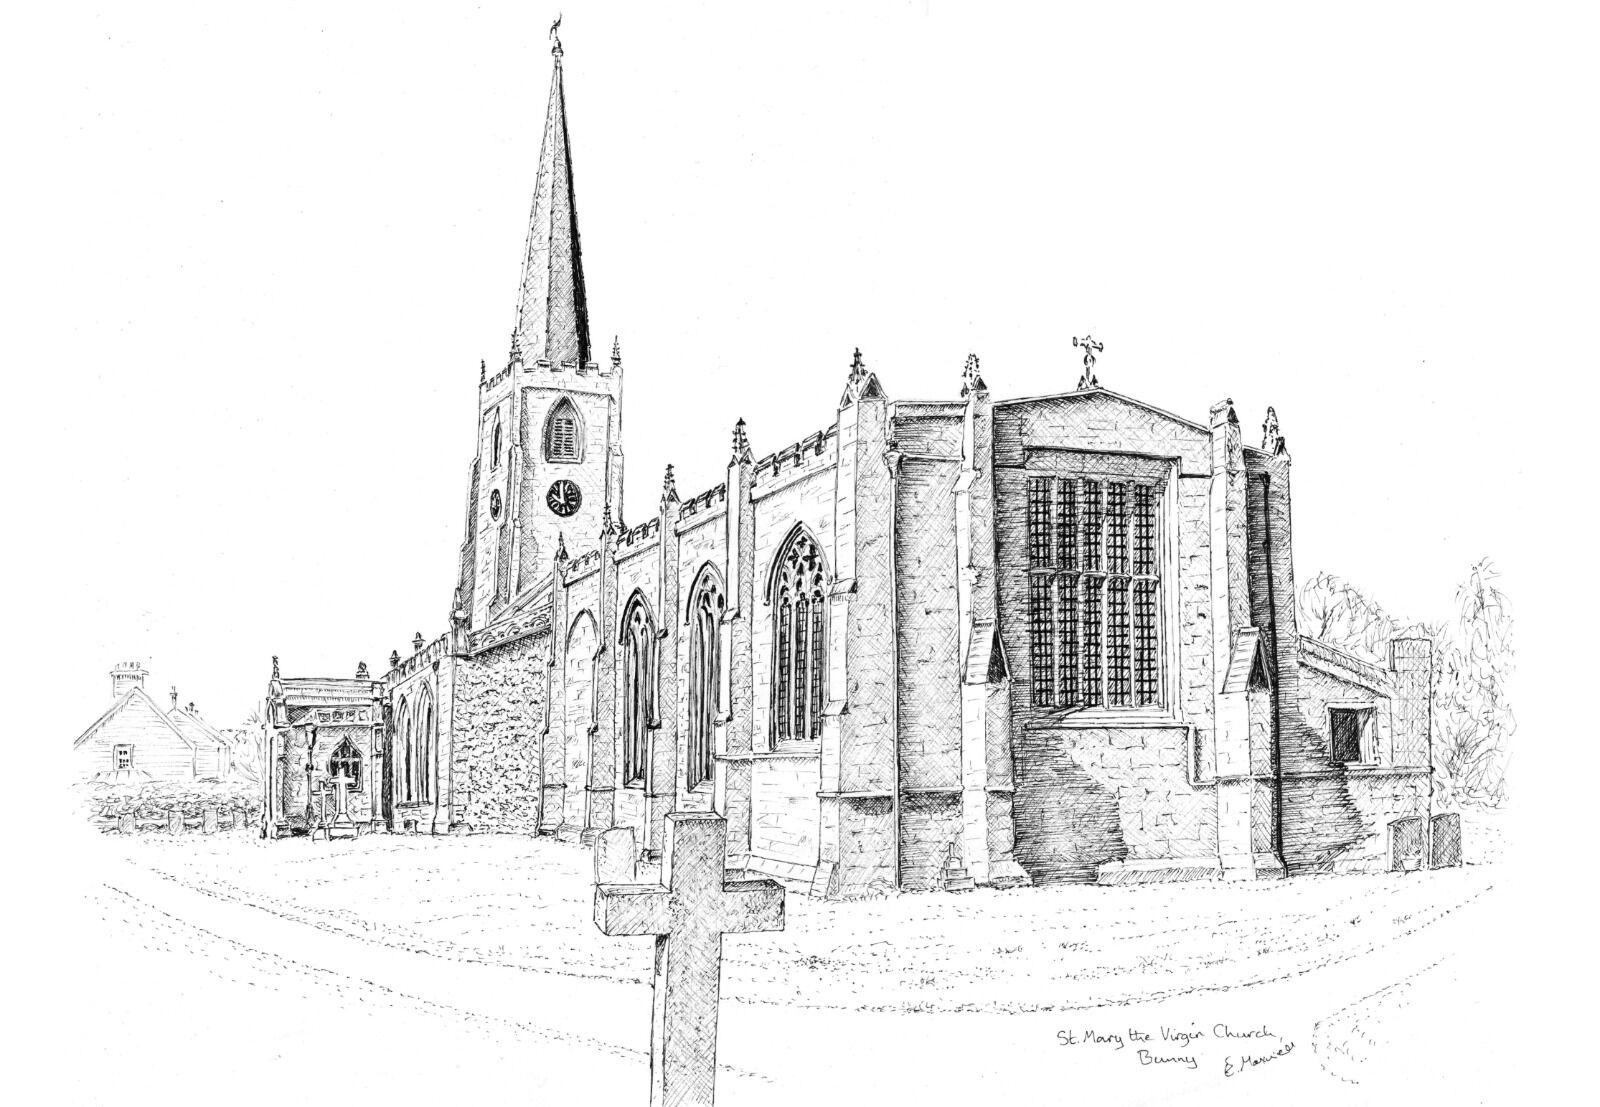 St Mary the Virgin Church, Bunny, Notts